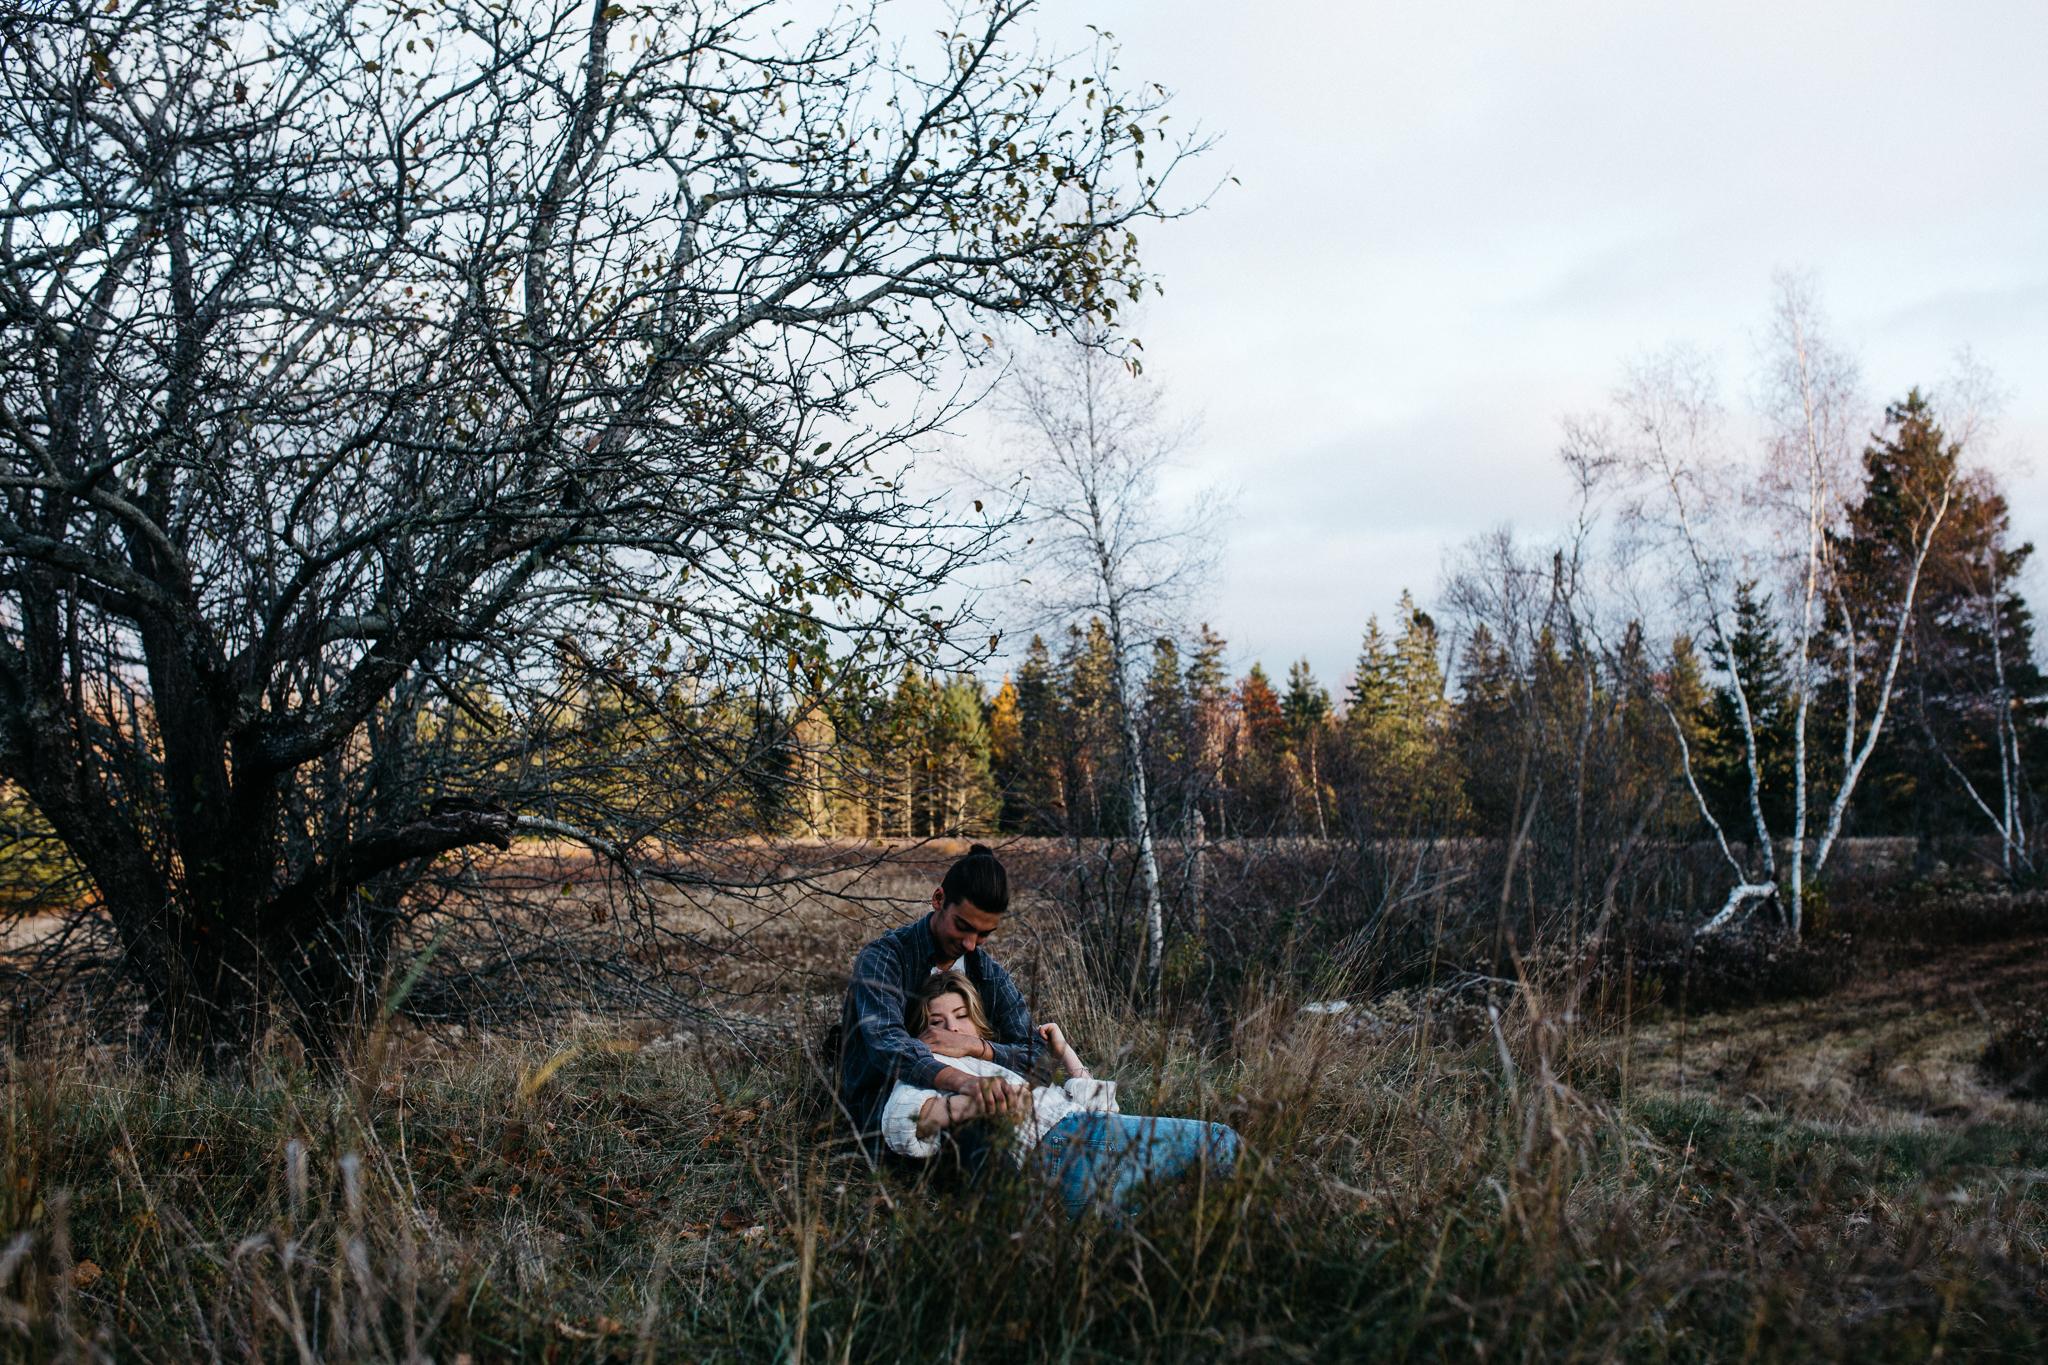 erinwheatcororyaylen-0763 Acadia National Park Lovers